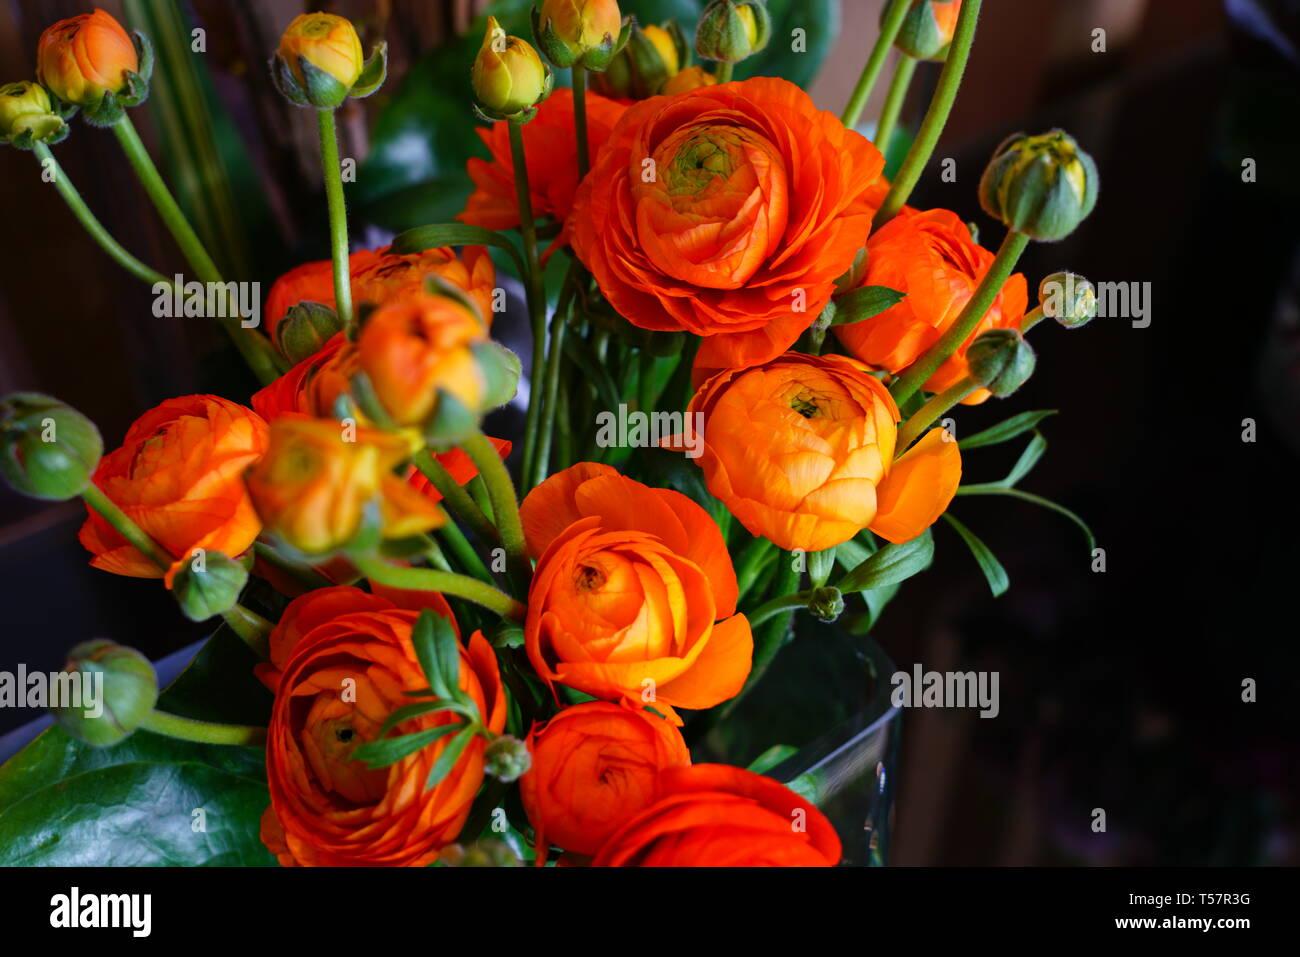 Bouquet Of Orange Ranunculus Flower In Bloom In A Clear Vase Stock Photo Alamy